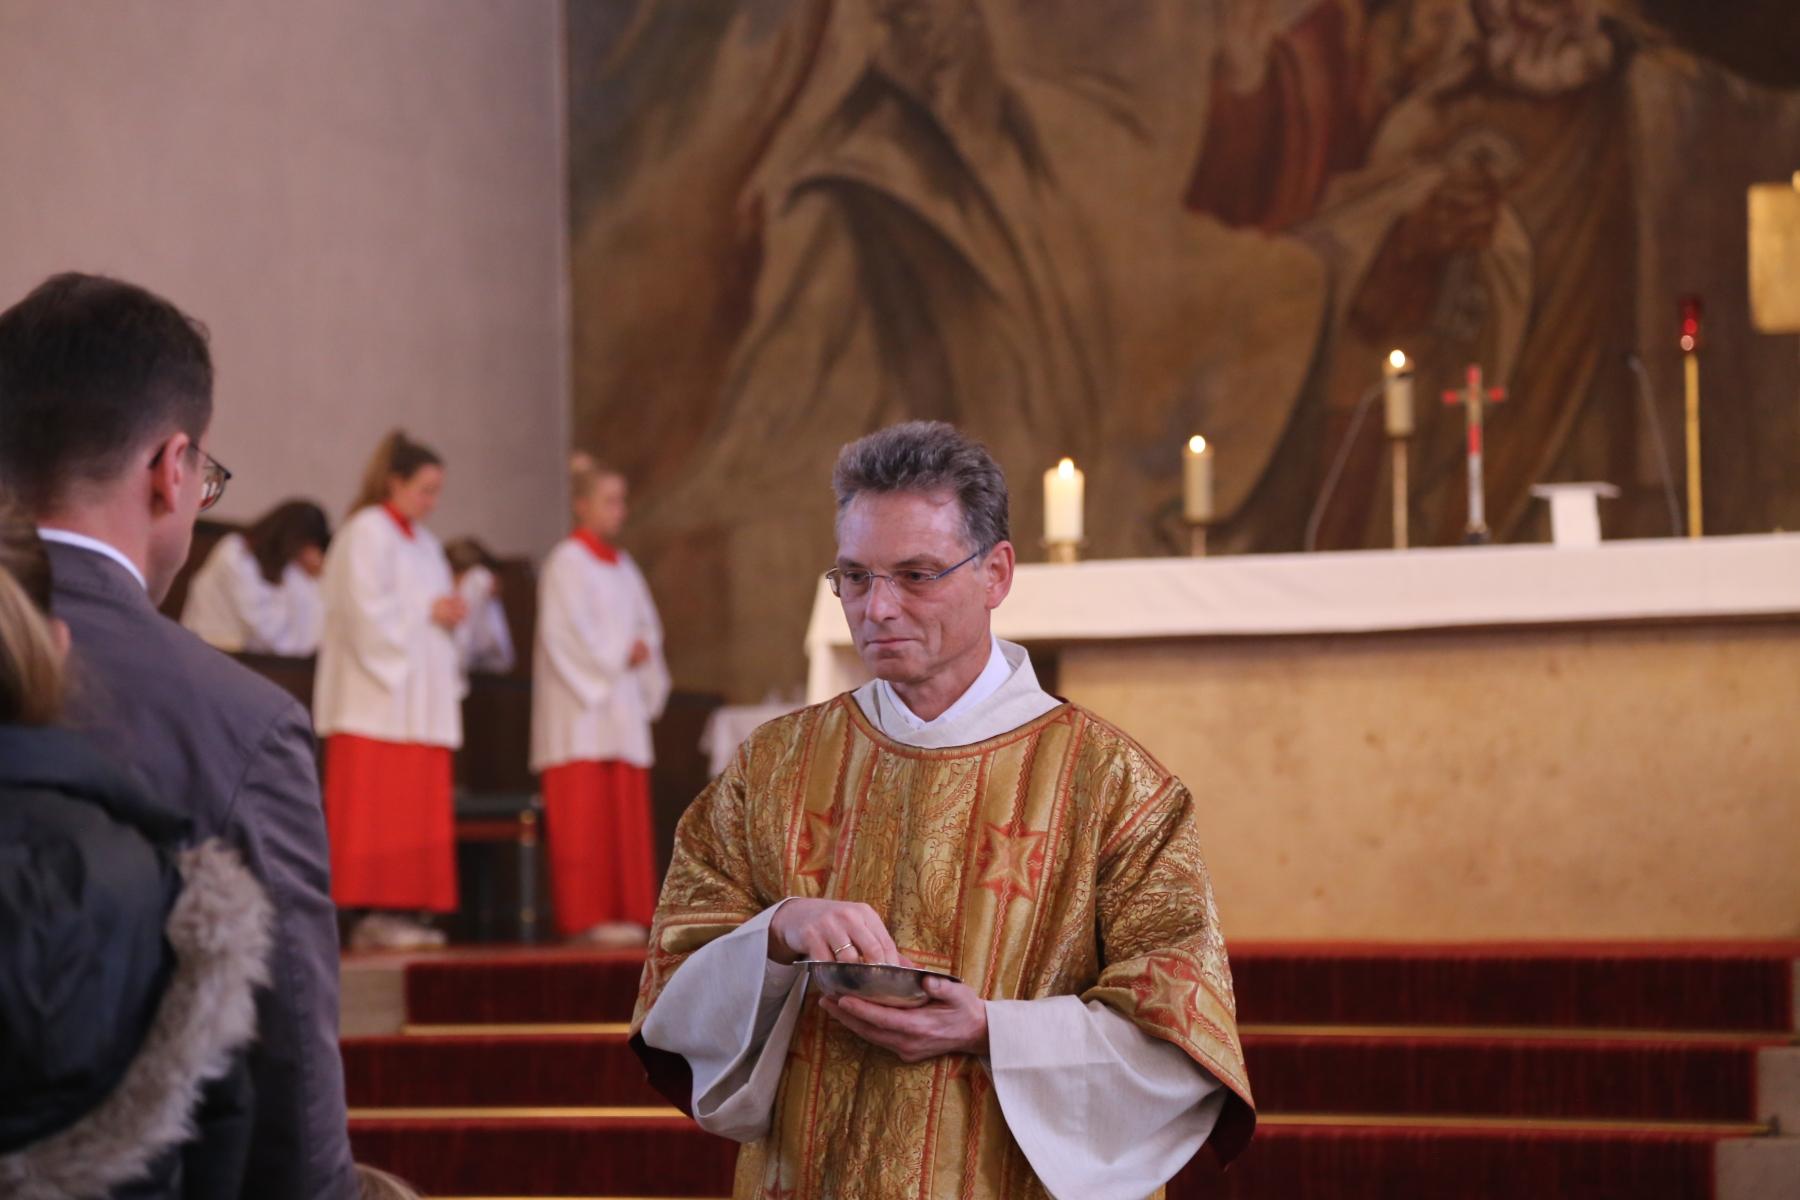 Kommunionausteilung Diakon Bernd Beigel